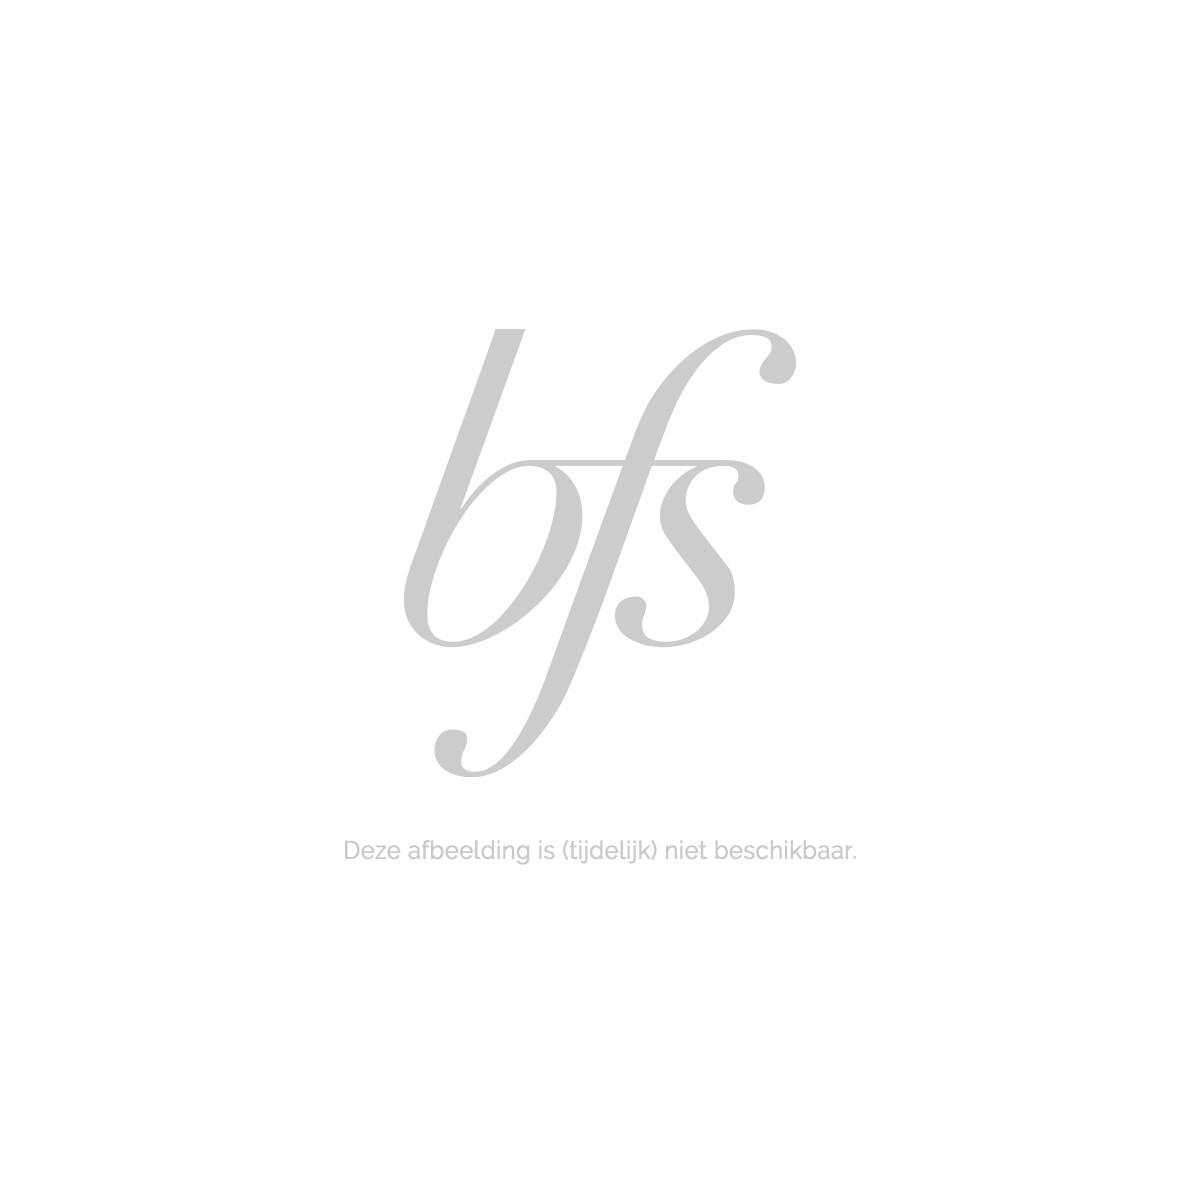 Sisley Botanical Gentle Facial Buffing Cream 50 Ml